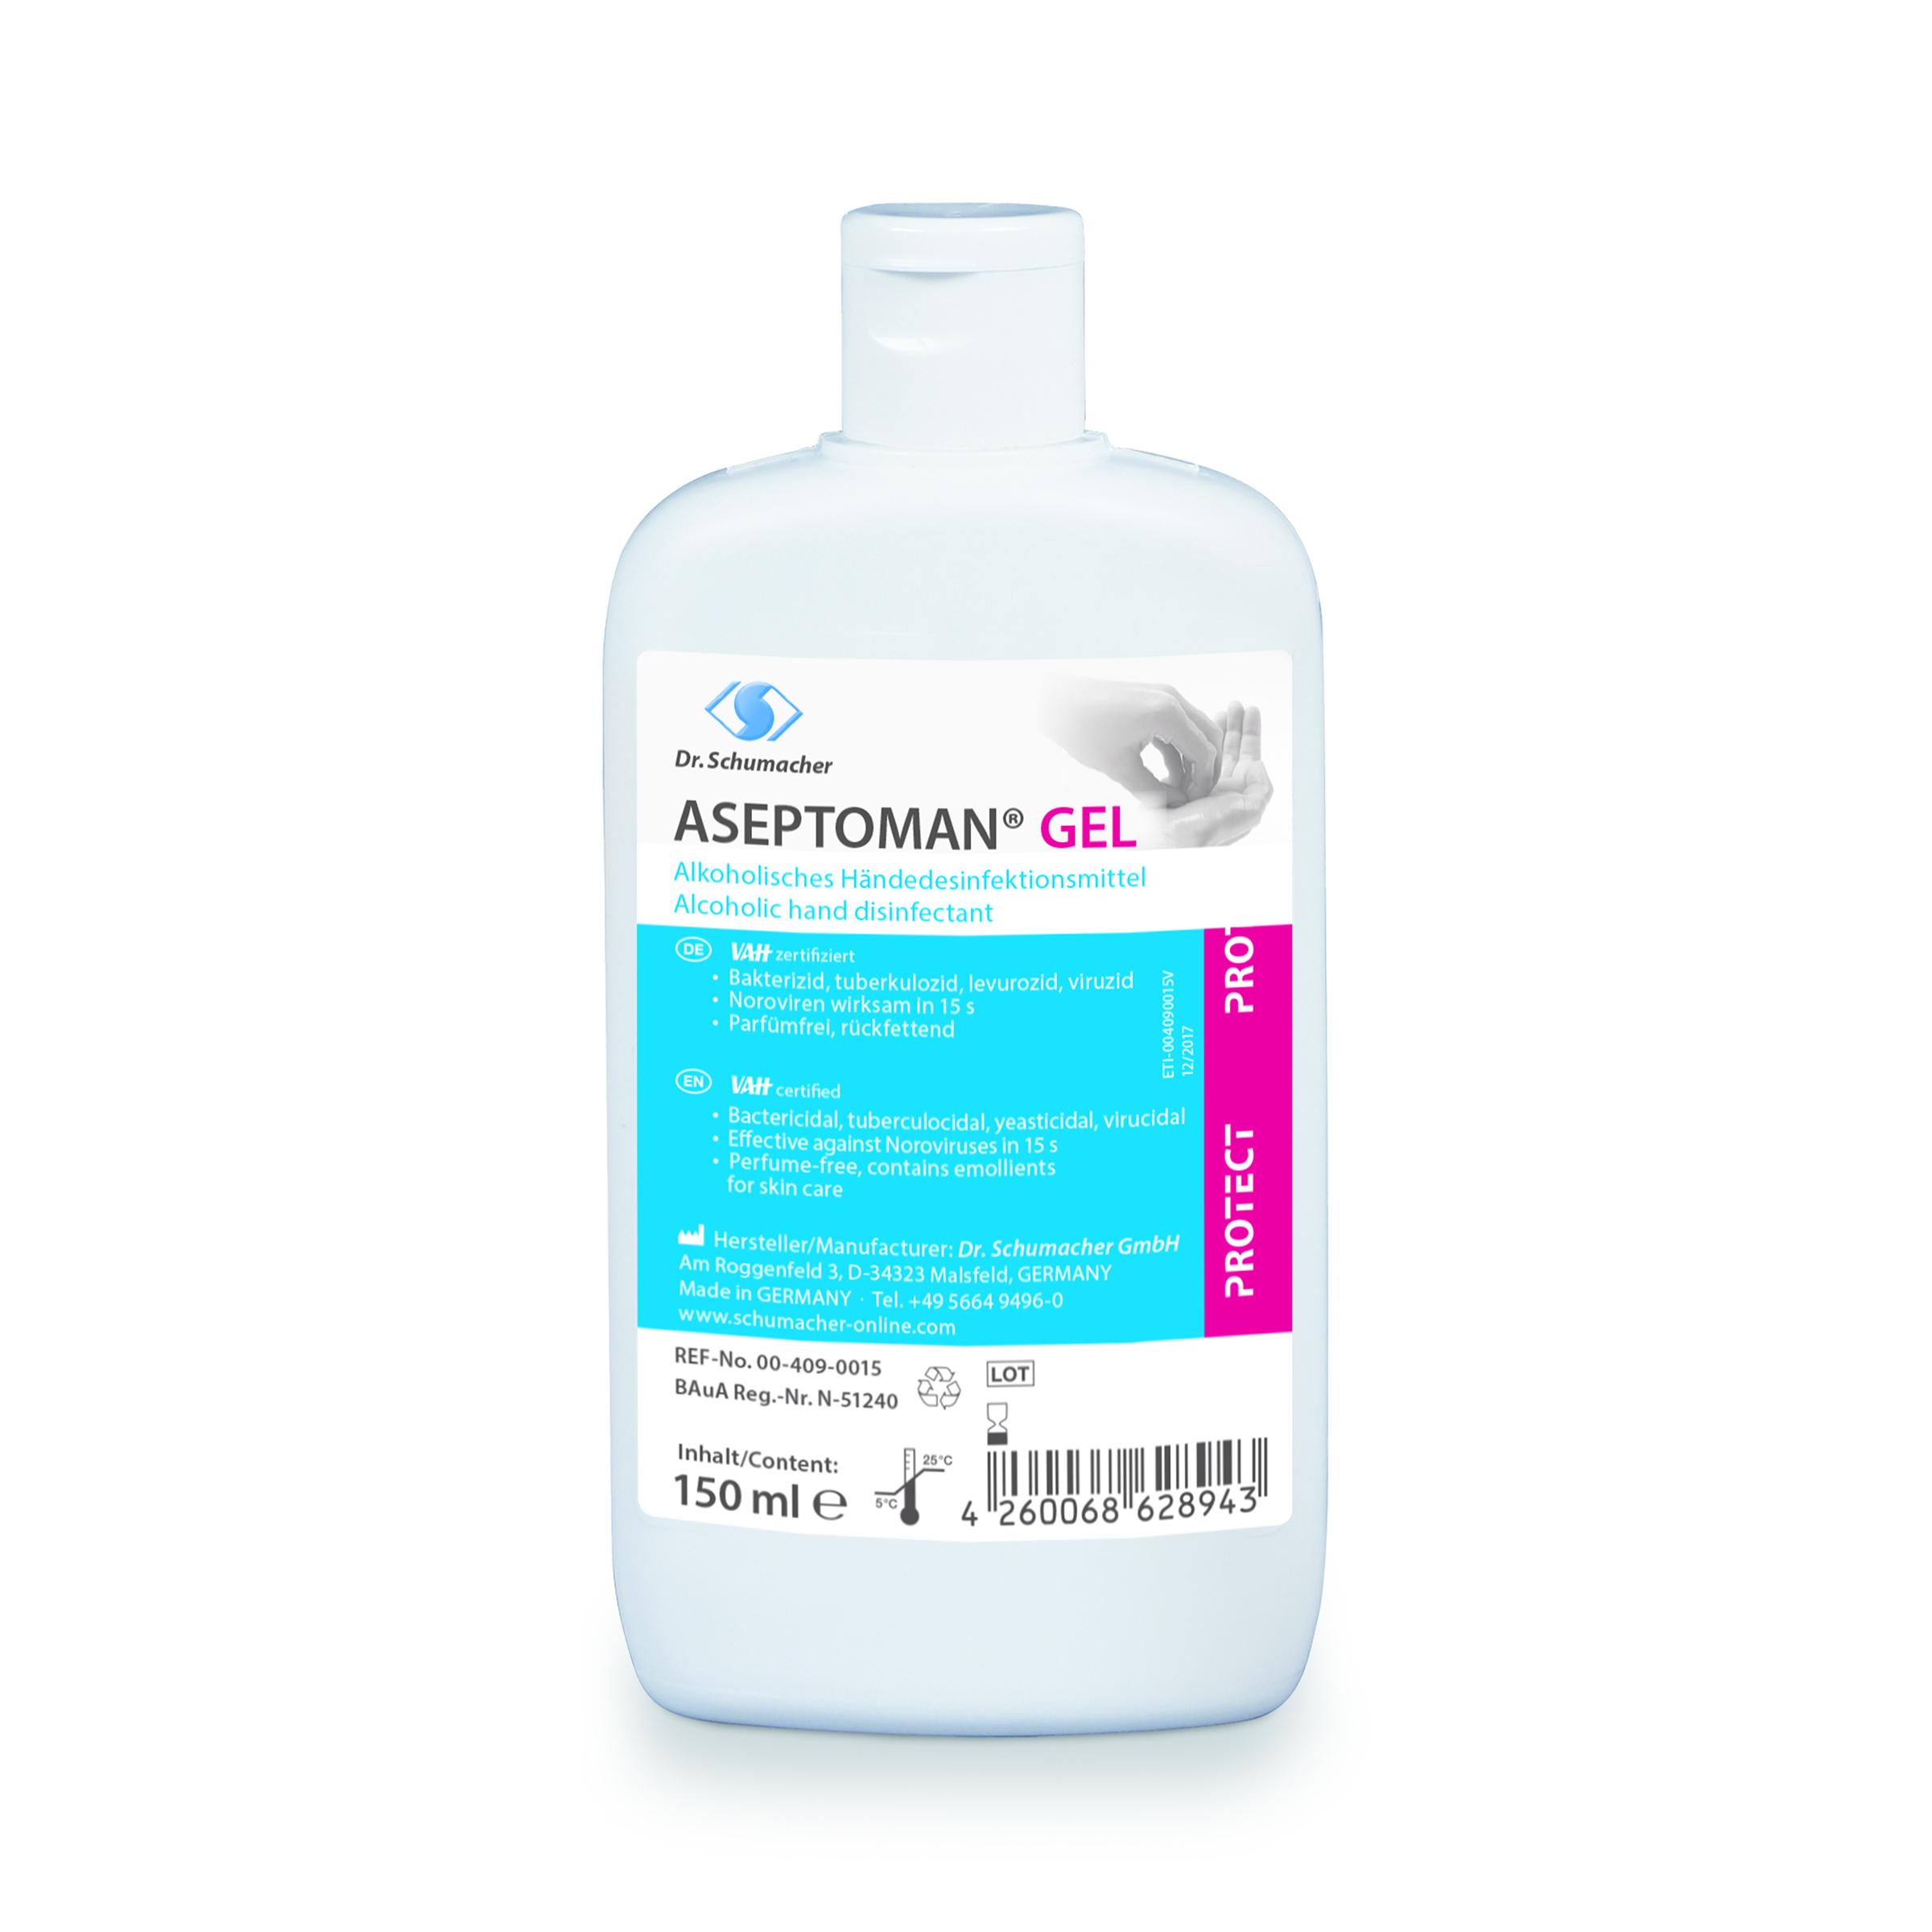 ASEPTOMAN GEL, Händedesinfektionsmittel, 150 ml Kittelflasche